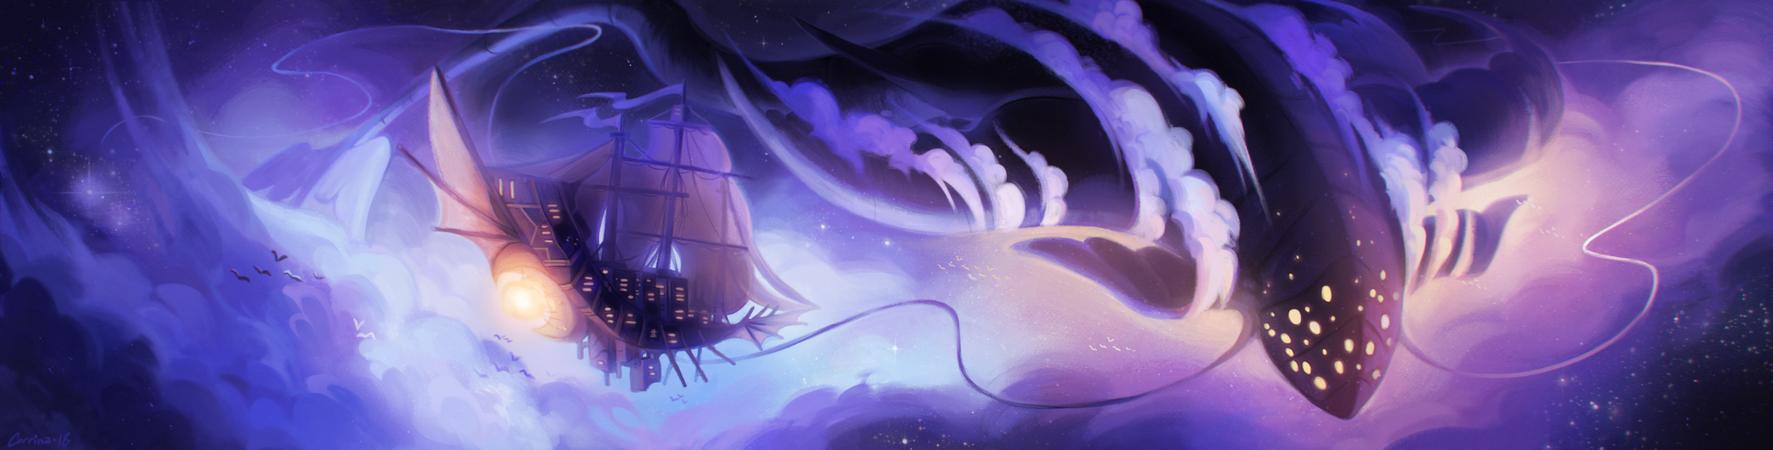 Astral Oceans